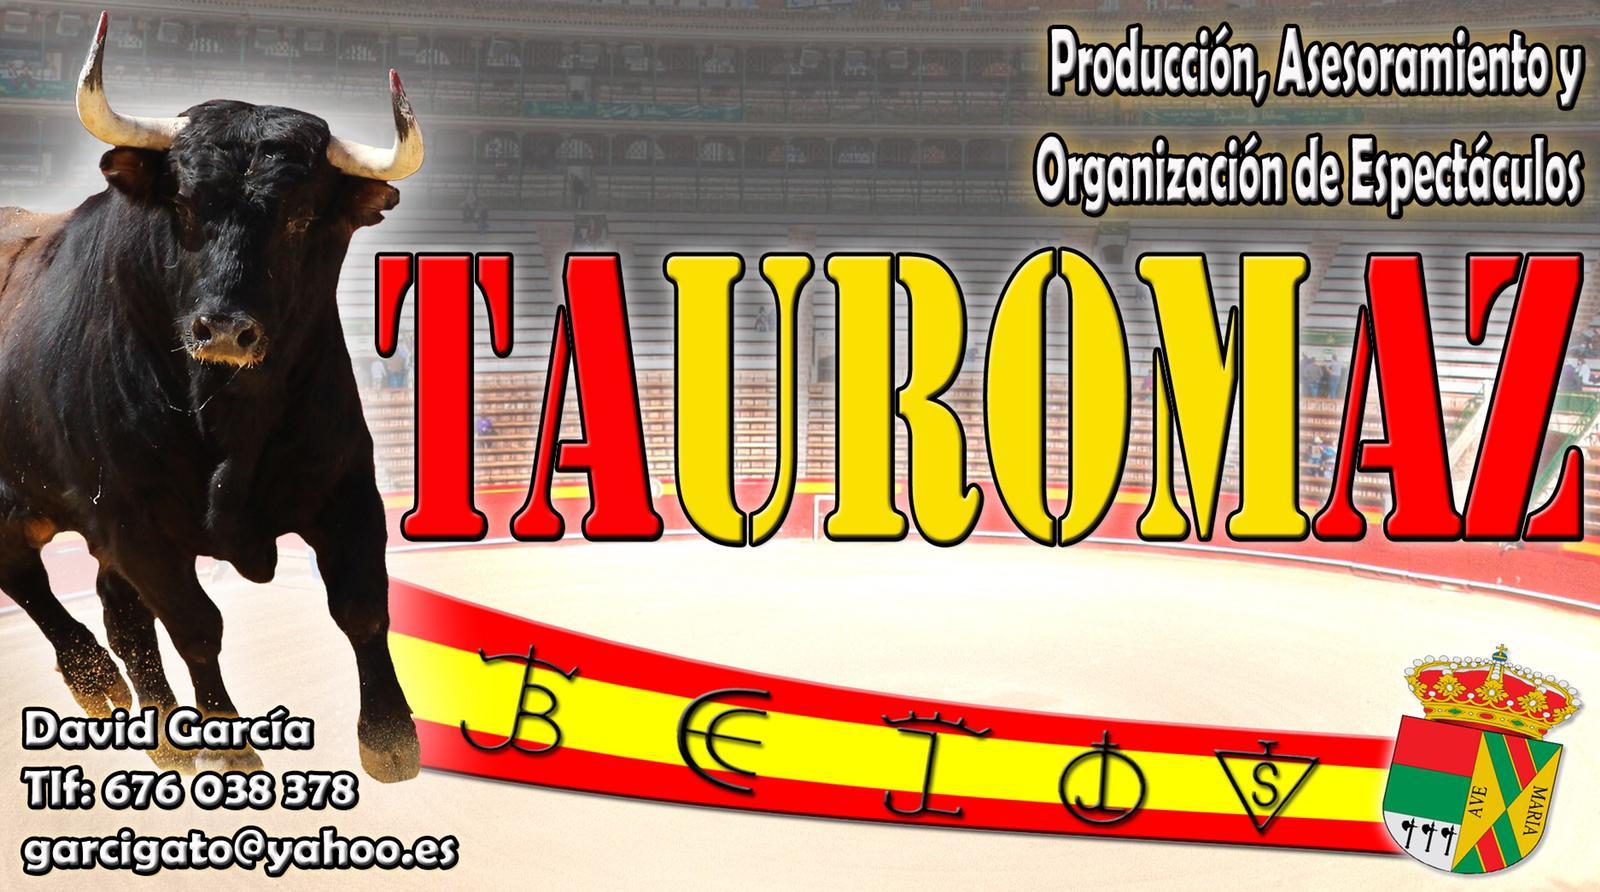 Tauromaz